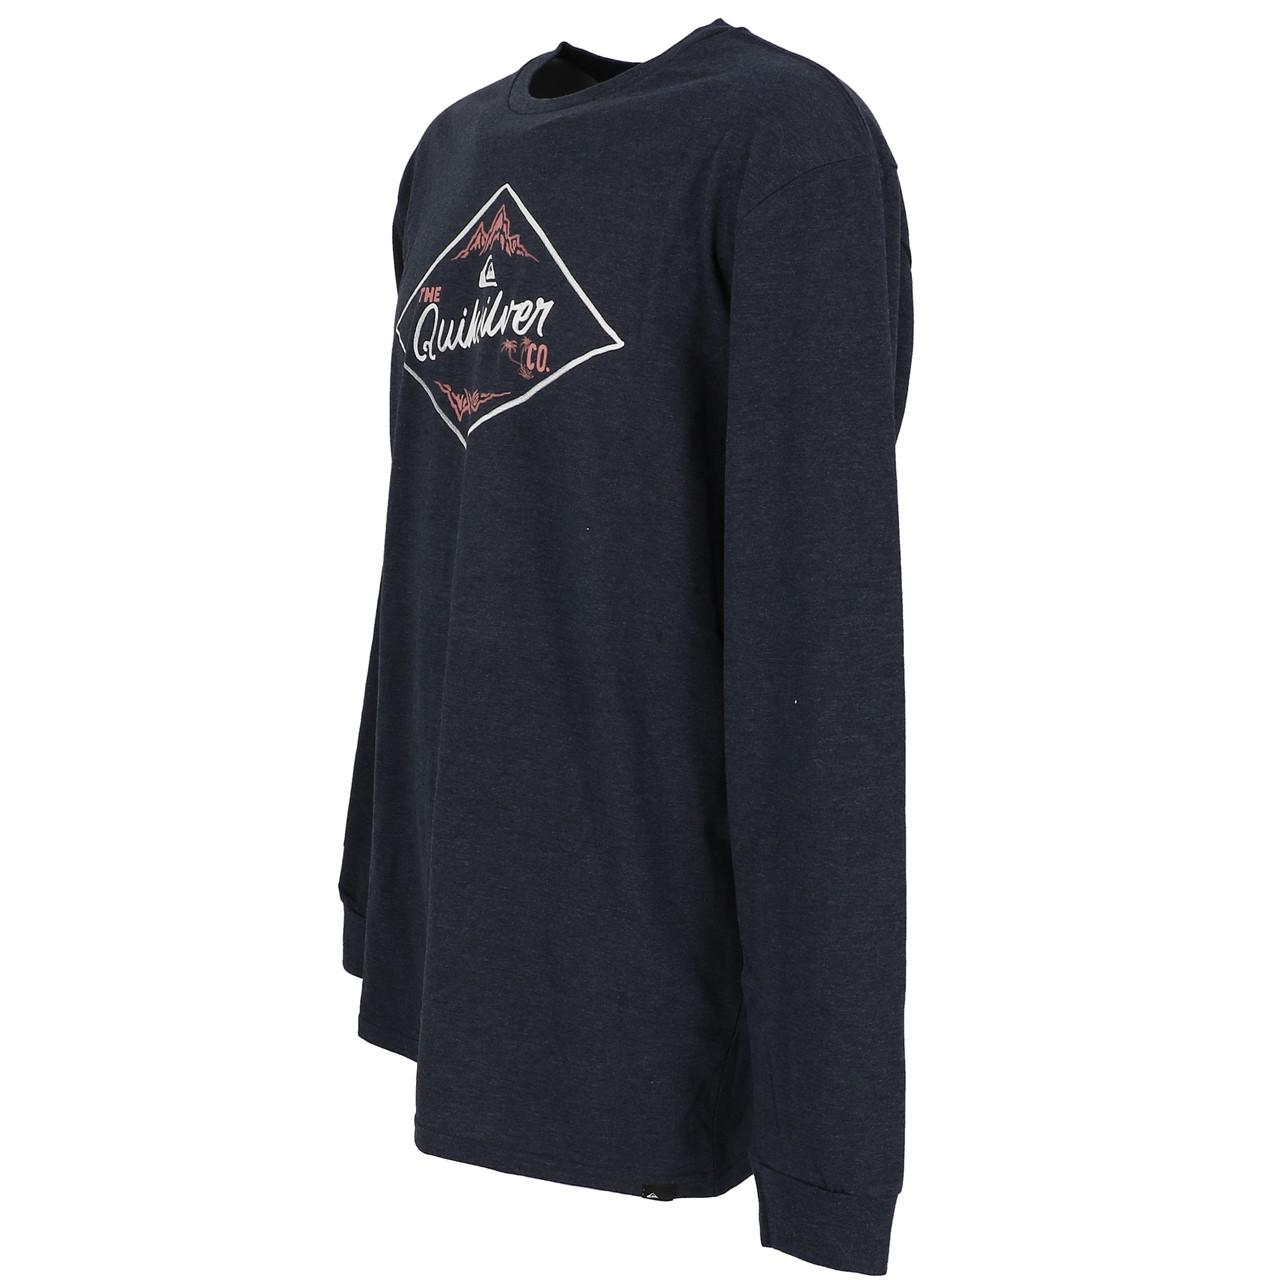 Tee-shirt-manches-longues-Quiksilver-California-wounds-nv-tee-Bleu-27852-Neuf miniature 4